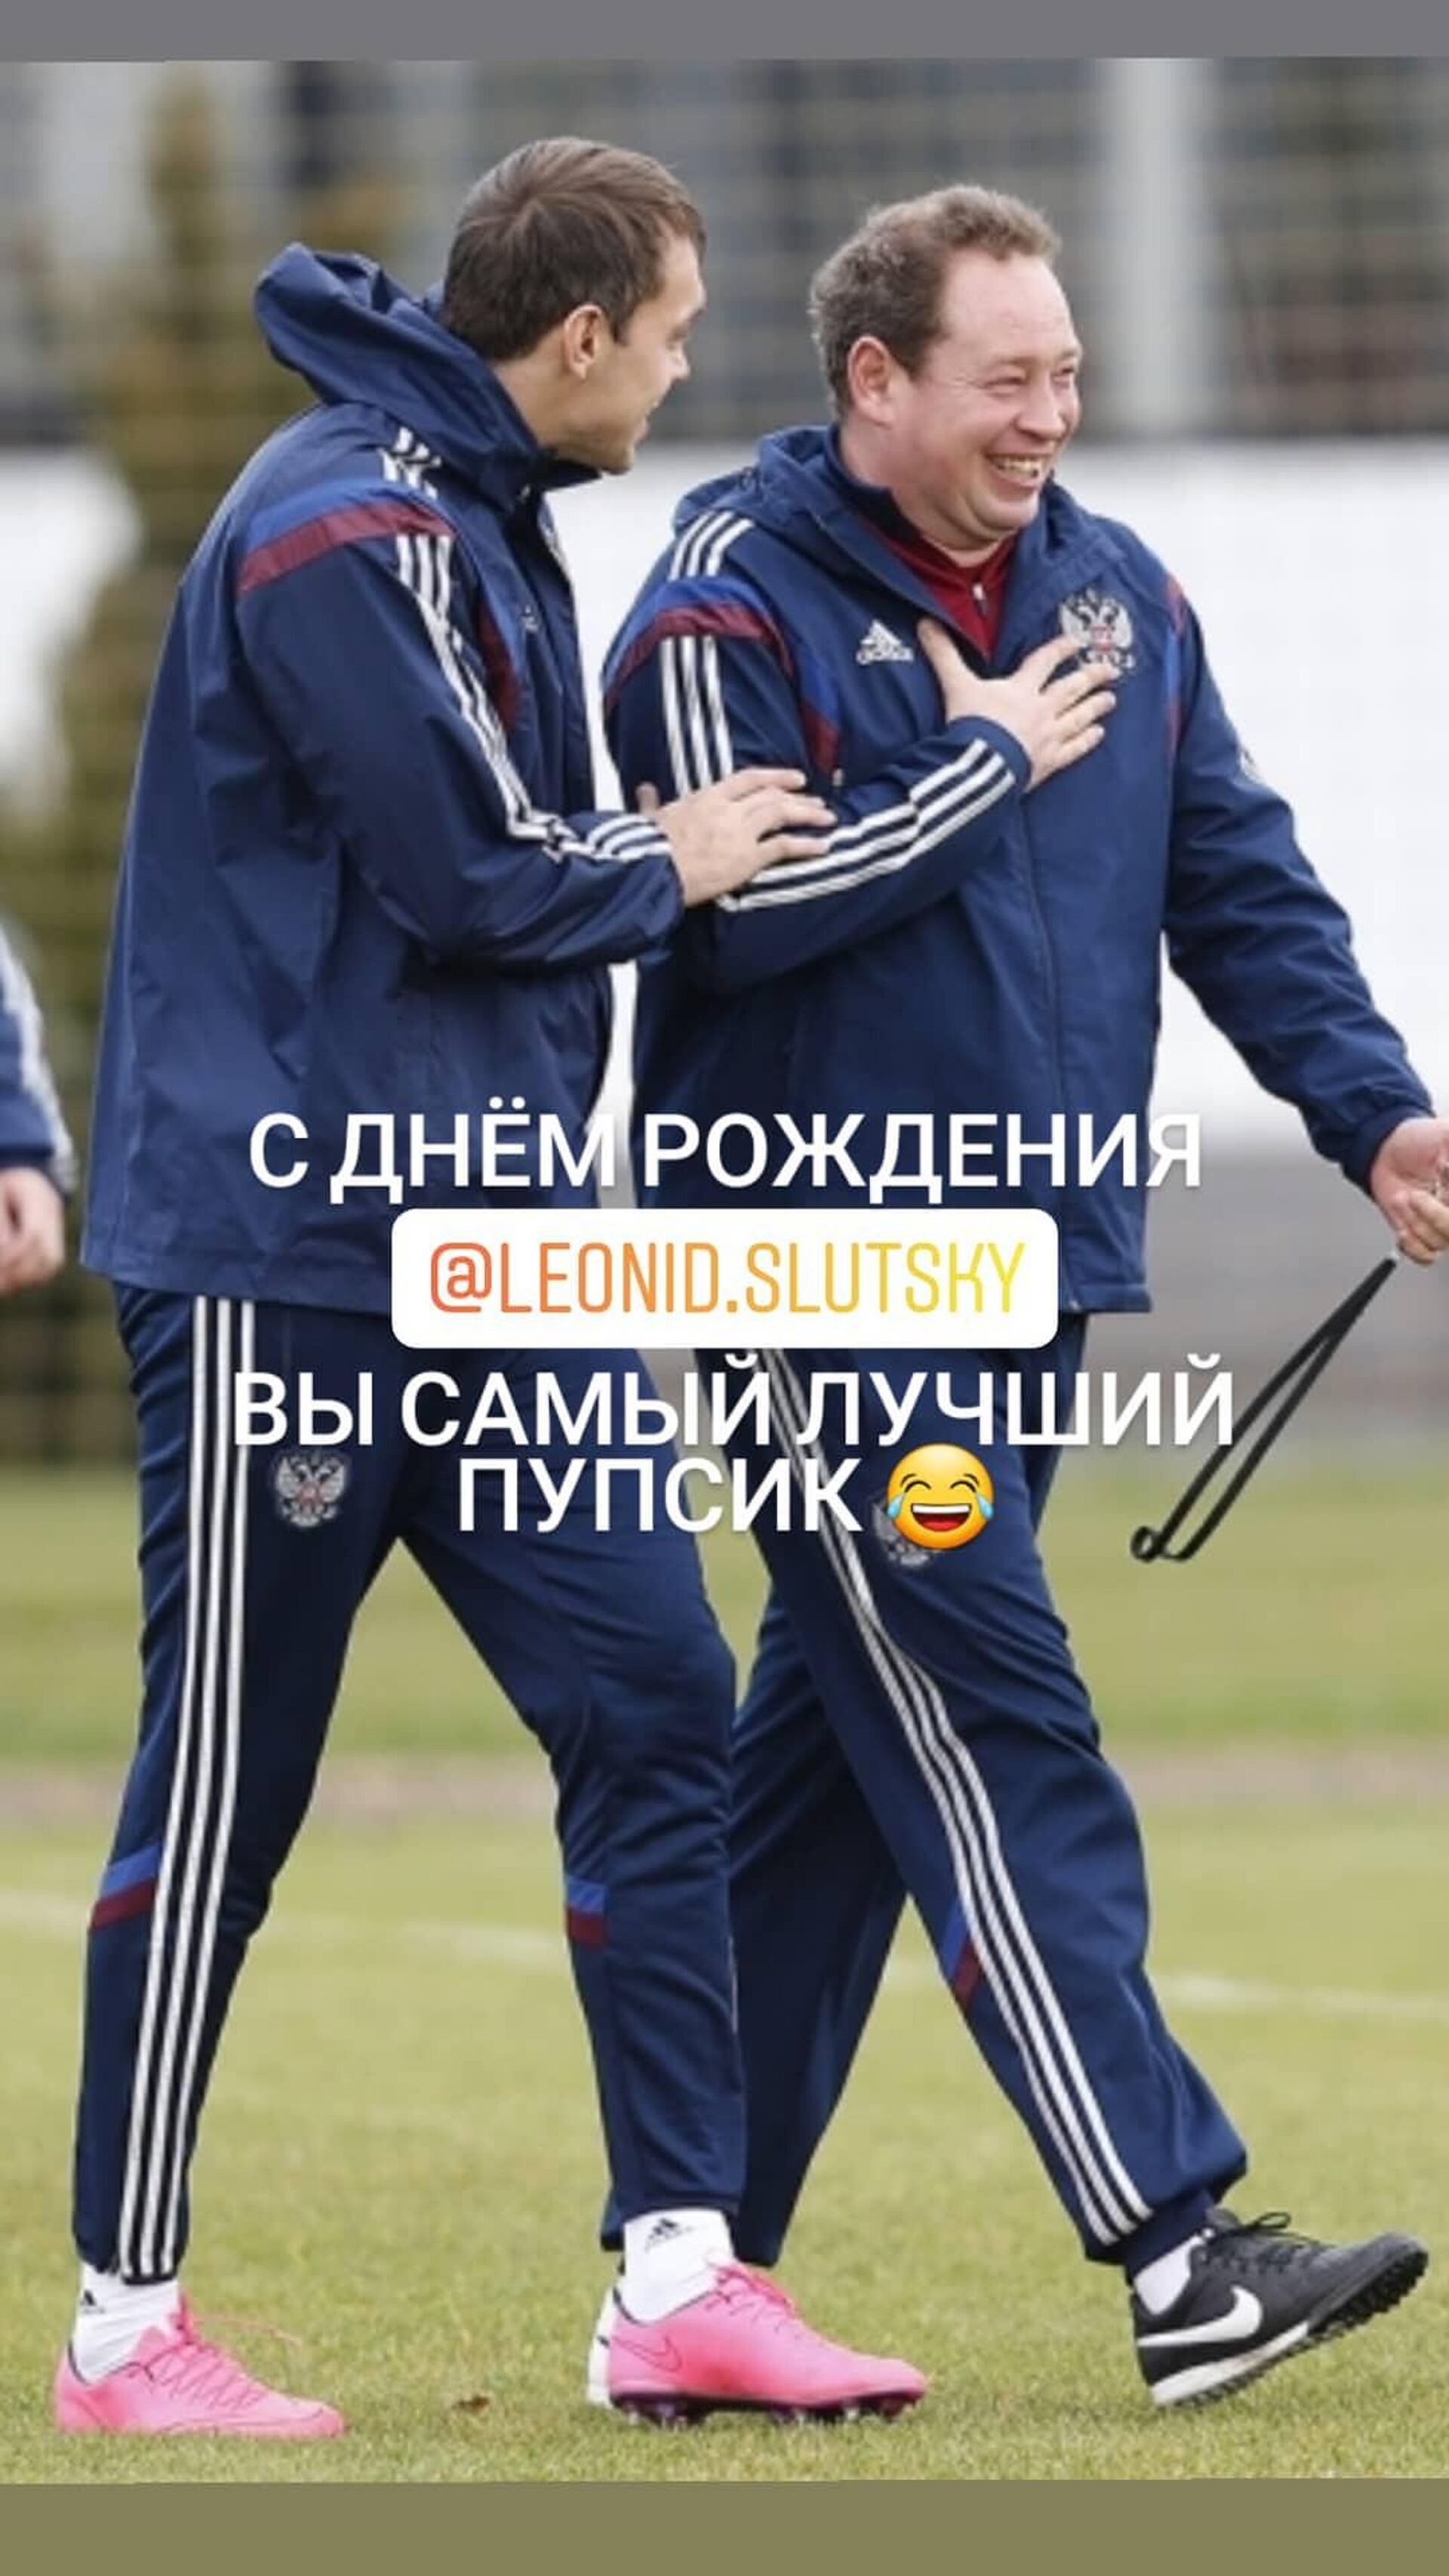 Футболист Артем Дзюба и тренер Леонид Слуцкий - РИА Новости, 1920, 04.05.2021